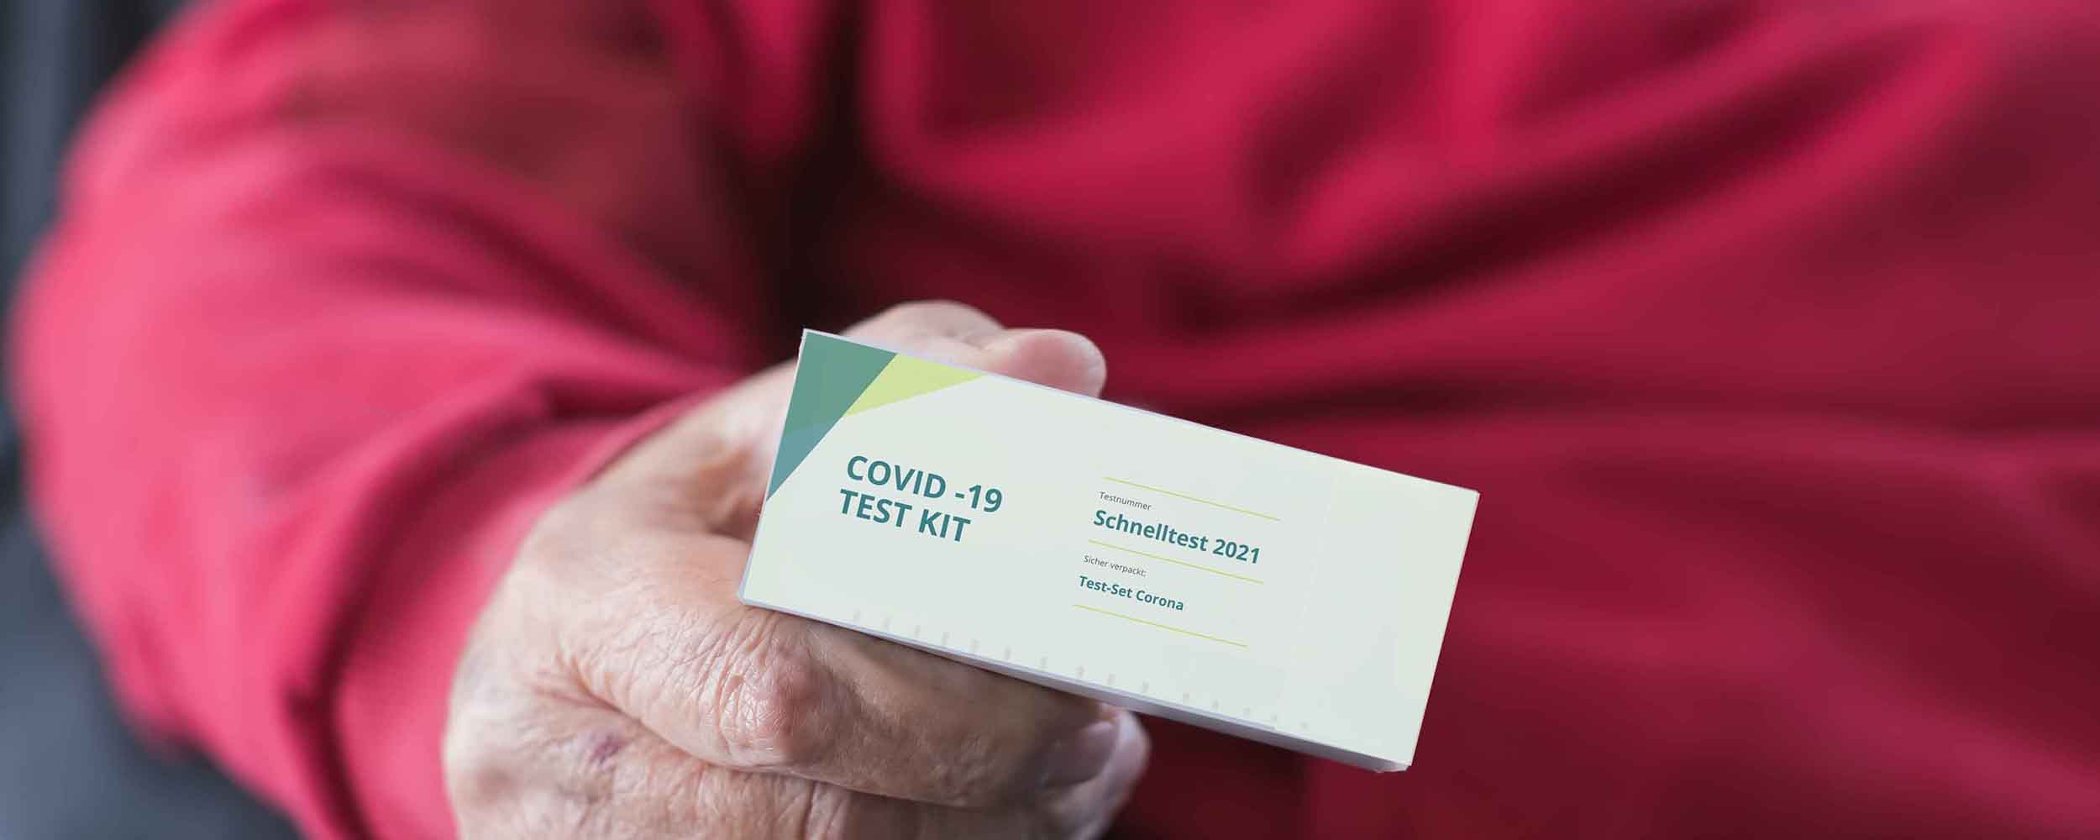 DruckArt Faltschachtel Covid-19 Test Kit Verpackung